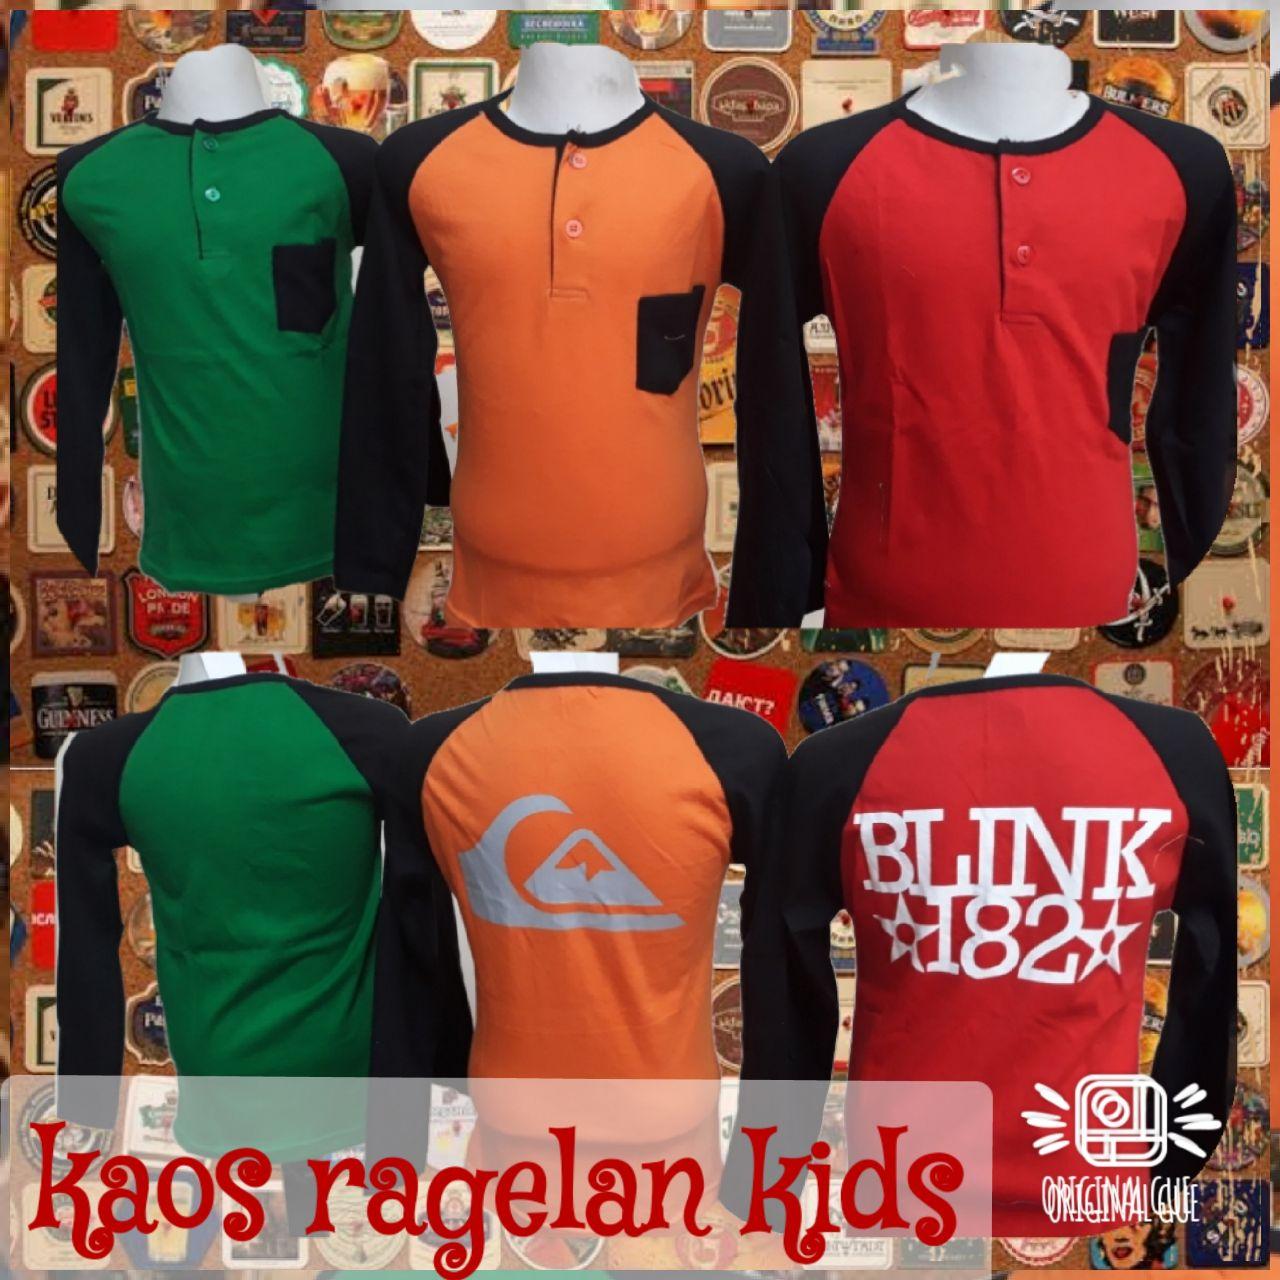 GROSIR PAKAIAN MURAH ONLINE DI BANDUNG Grosir Kaos Ragelan Kids Anak Laki Laki Murah Bandung Rp.19.500